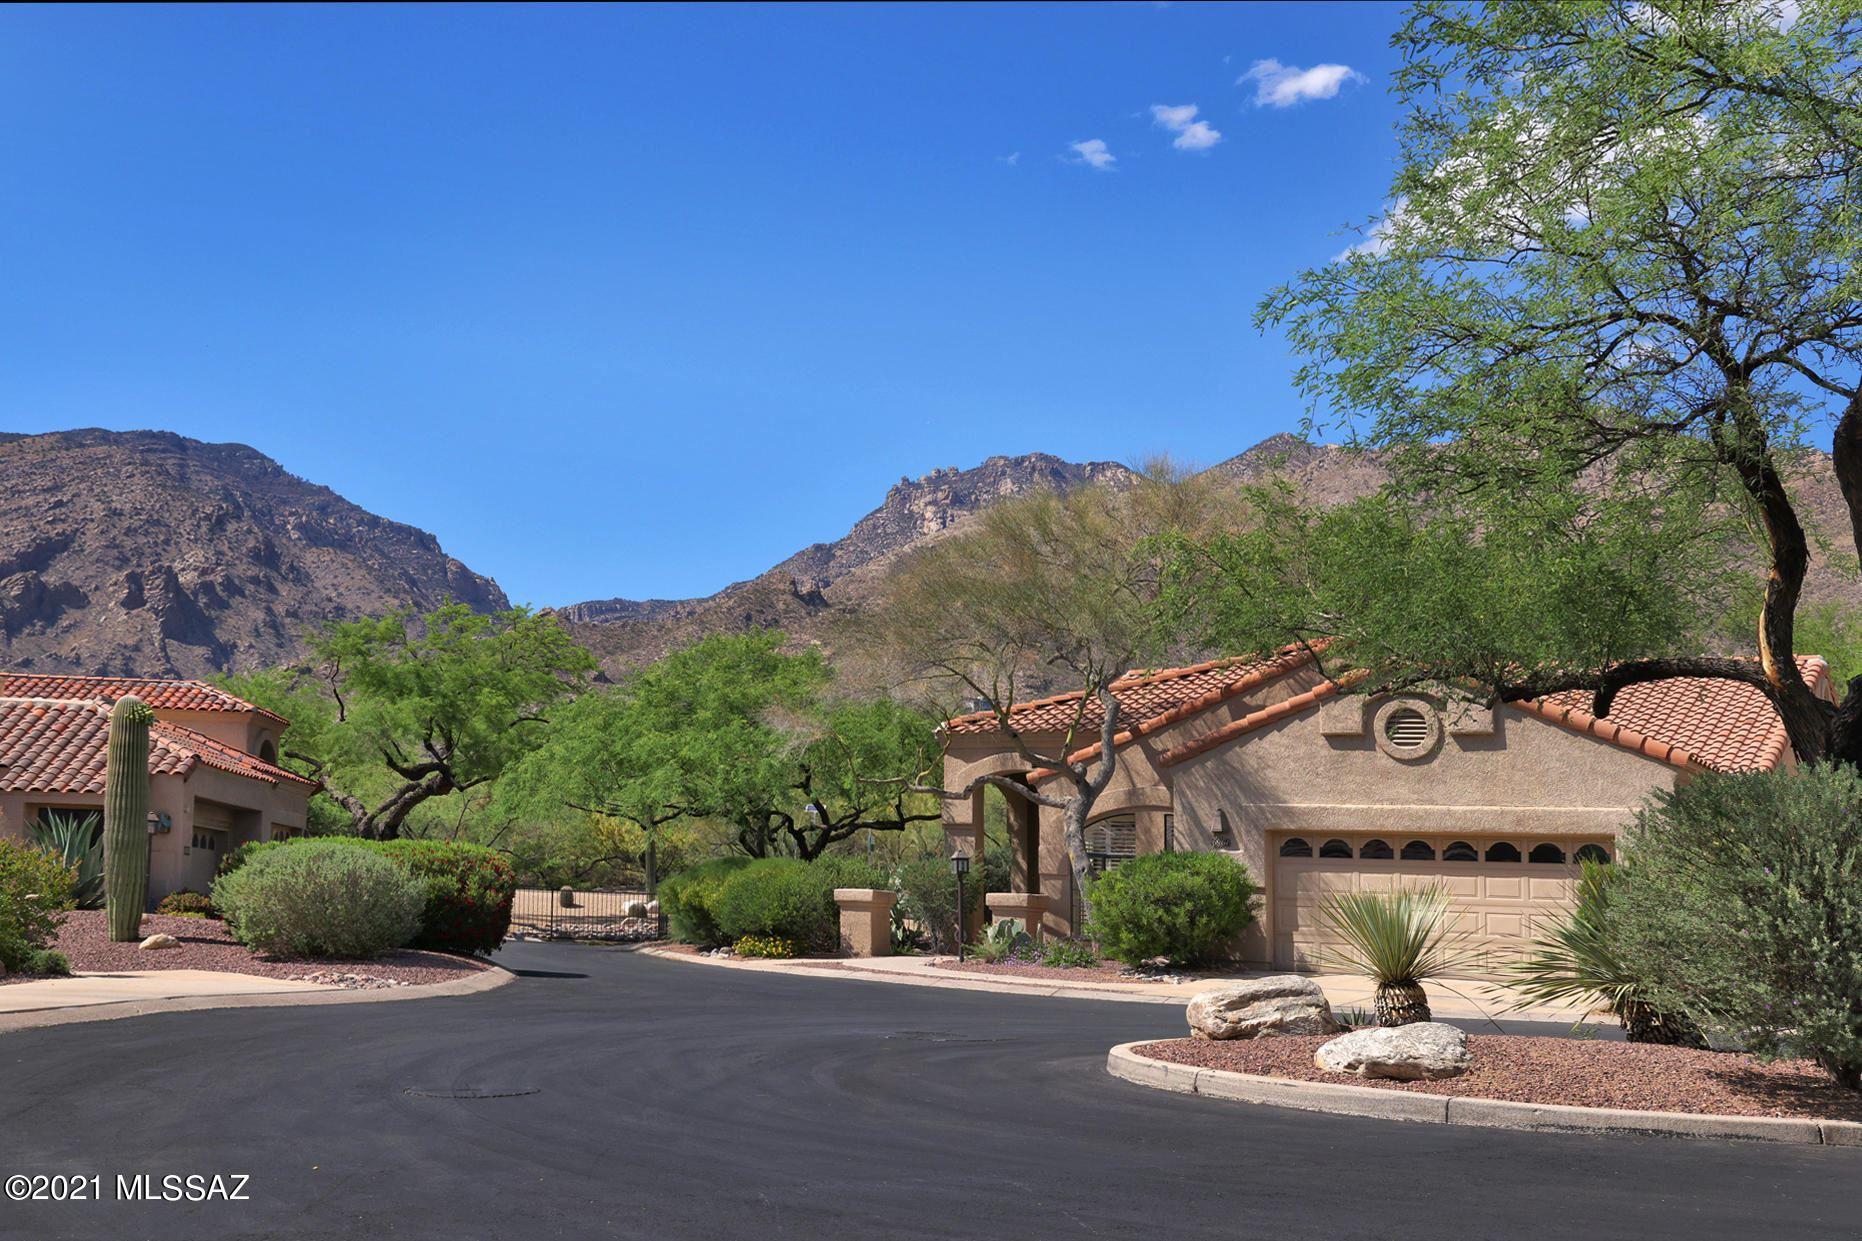 6961 E Cicada Court, Tucson, AZ 85750 - MLS#: 22112604